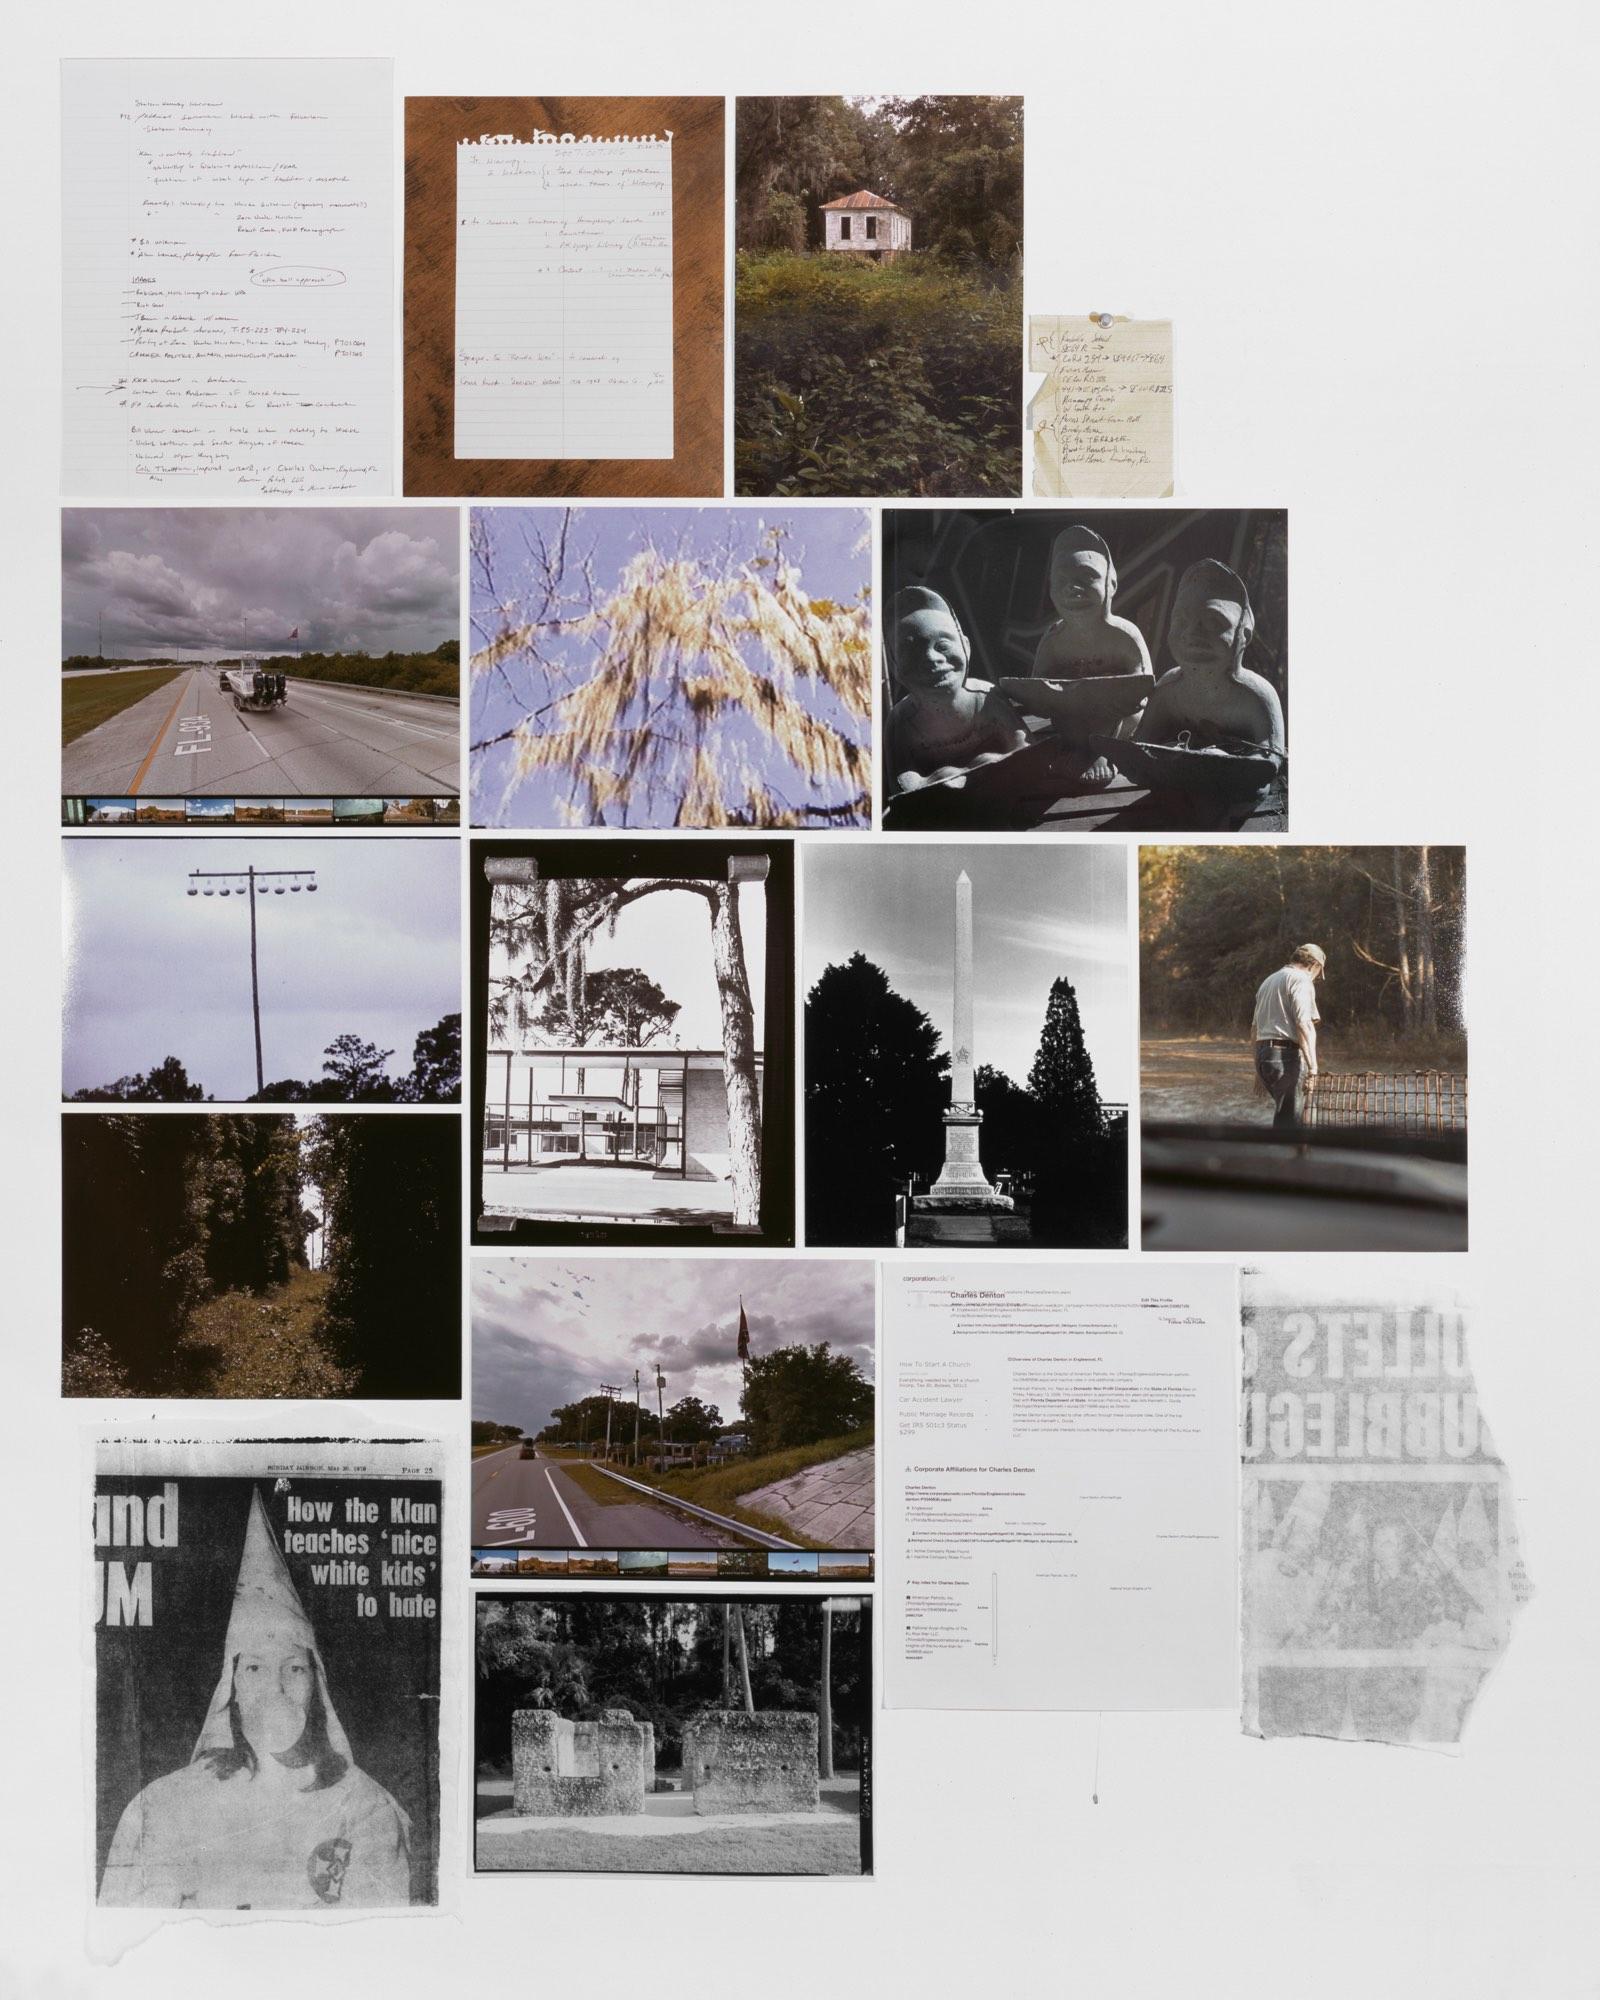 Atlas 4, Phantom Documents, Invisible Monuments, 40 x 50 inches, Digital pigment print, 2015